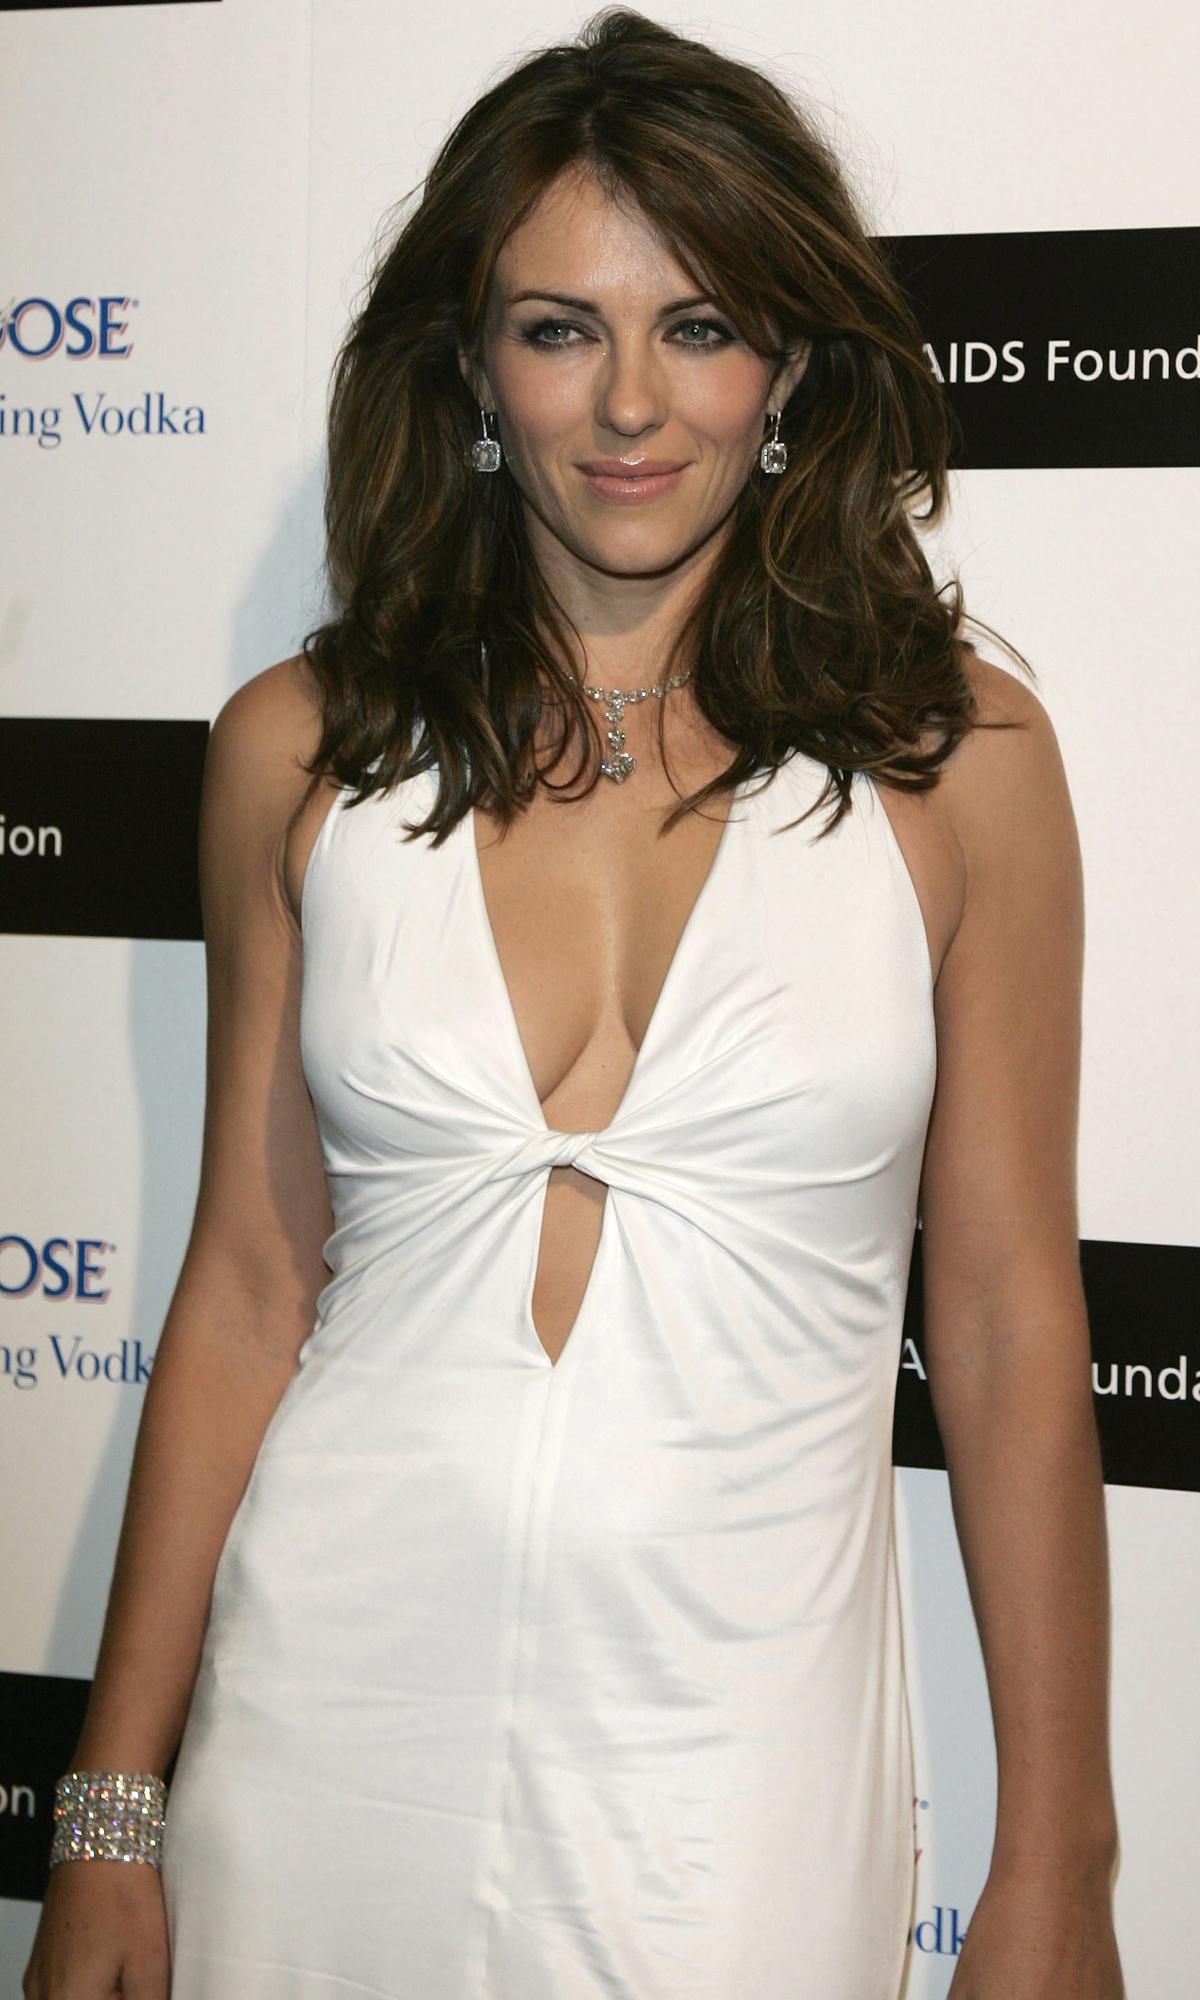 Brytyjska aktorka Elizabeth Hurley